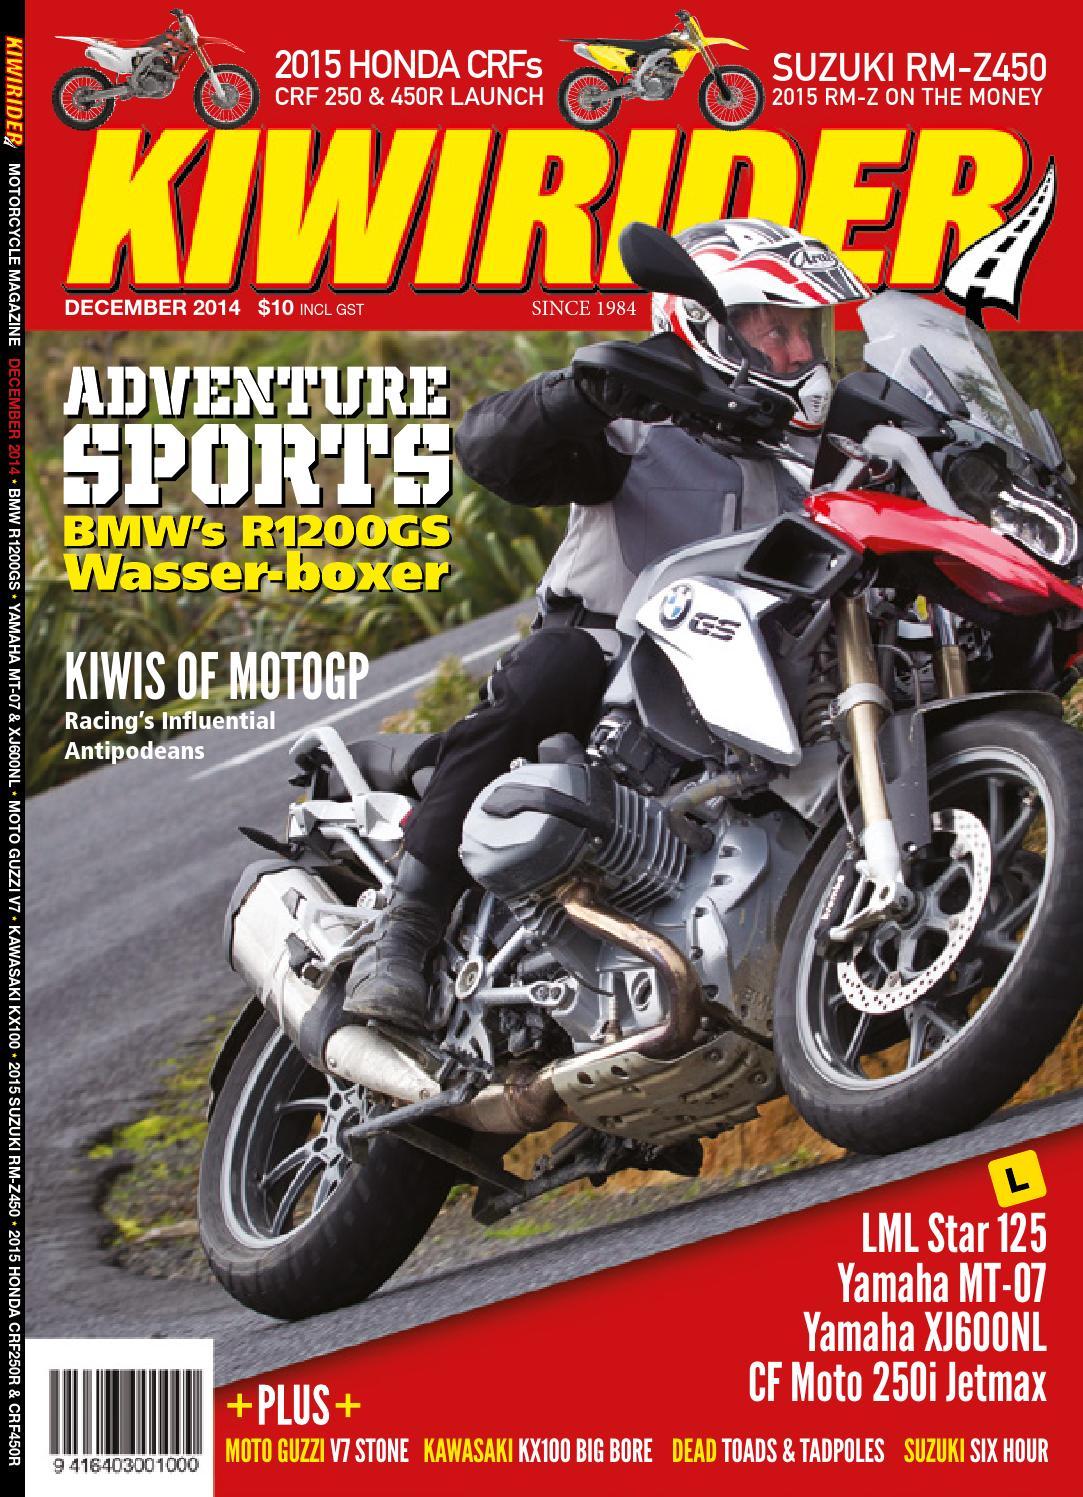 Keiti Additions Motorcycle Rim Wheel Stripe Kit ORANGE KTM Harley Davidson